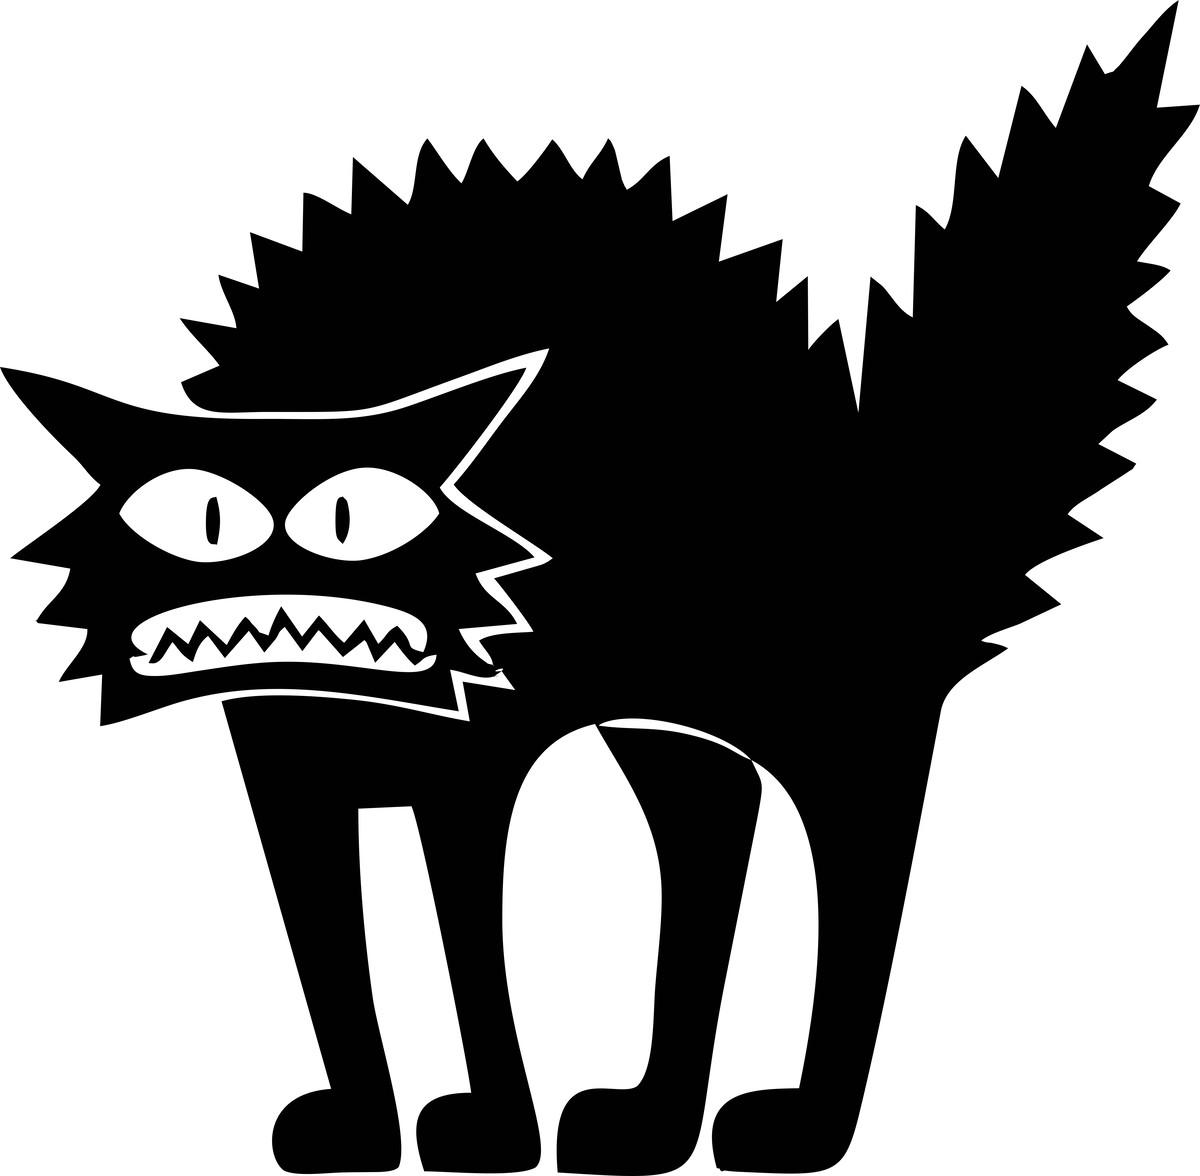 Adesivo De Parede Gato Assustado 40x40 No Elo7 So Personalizados